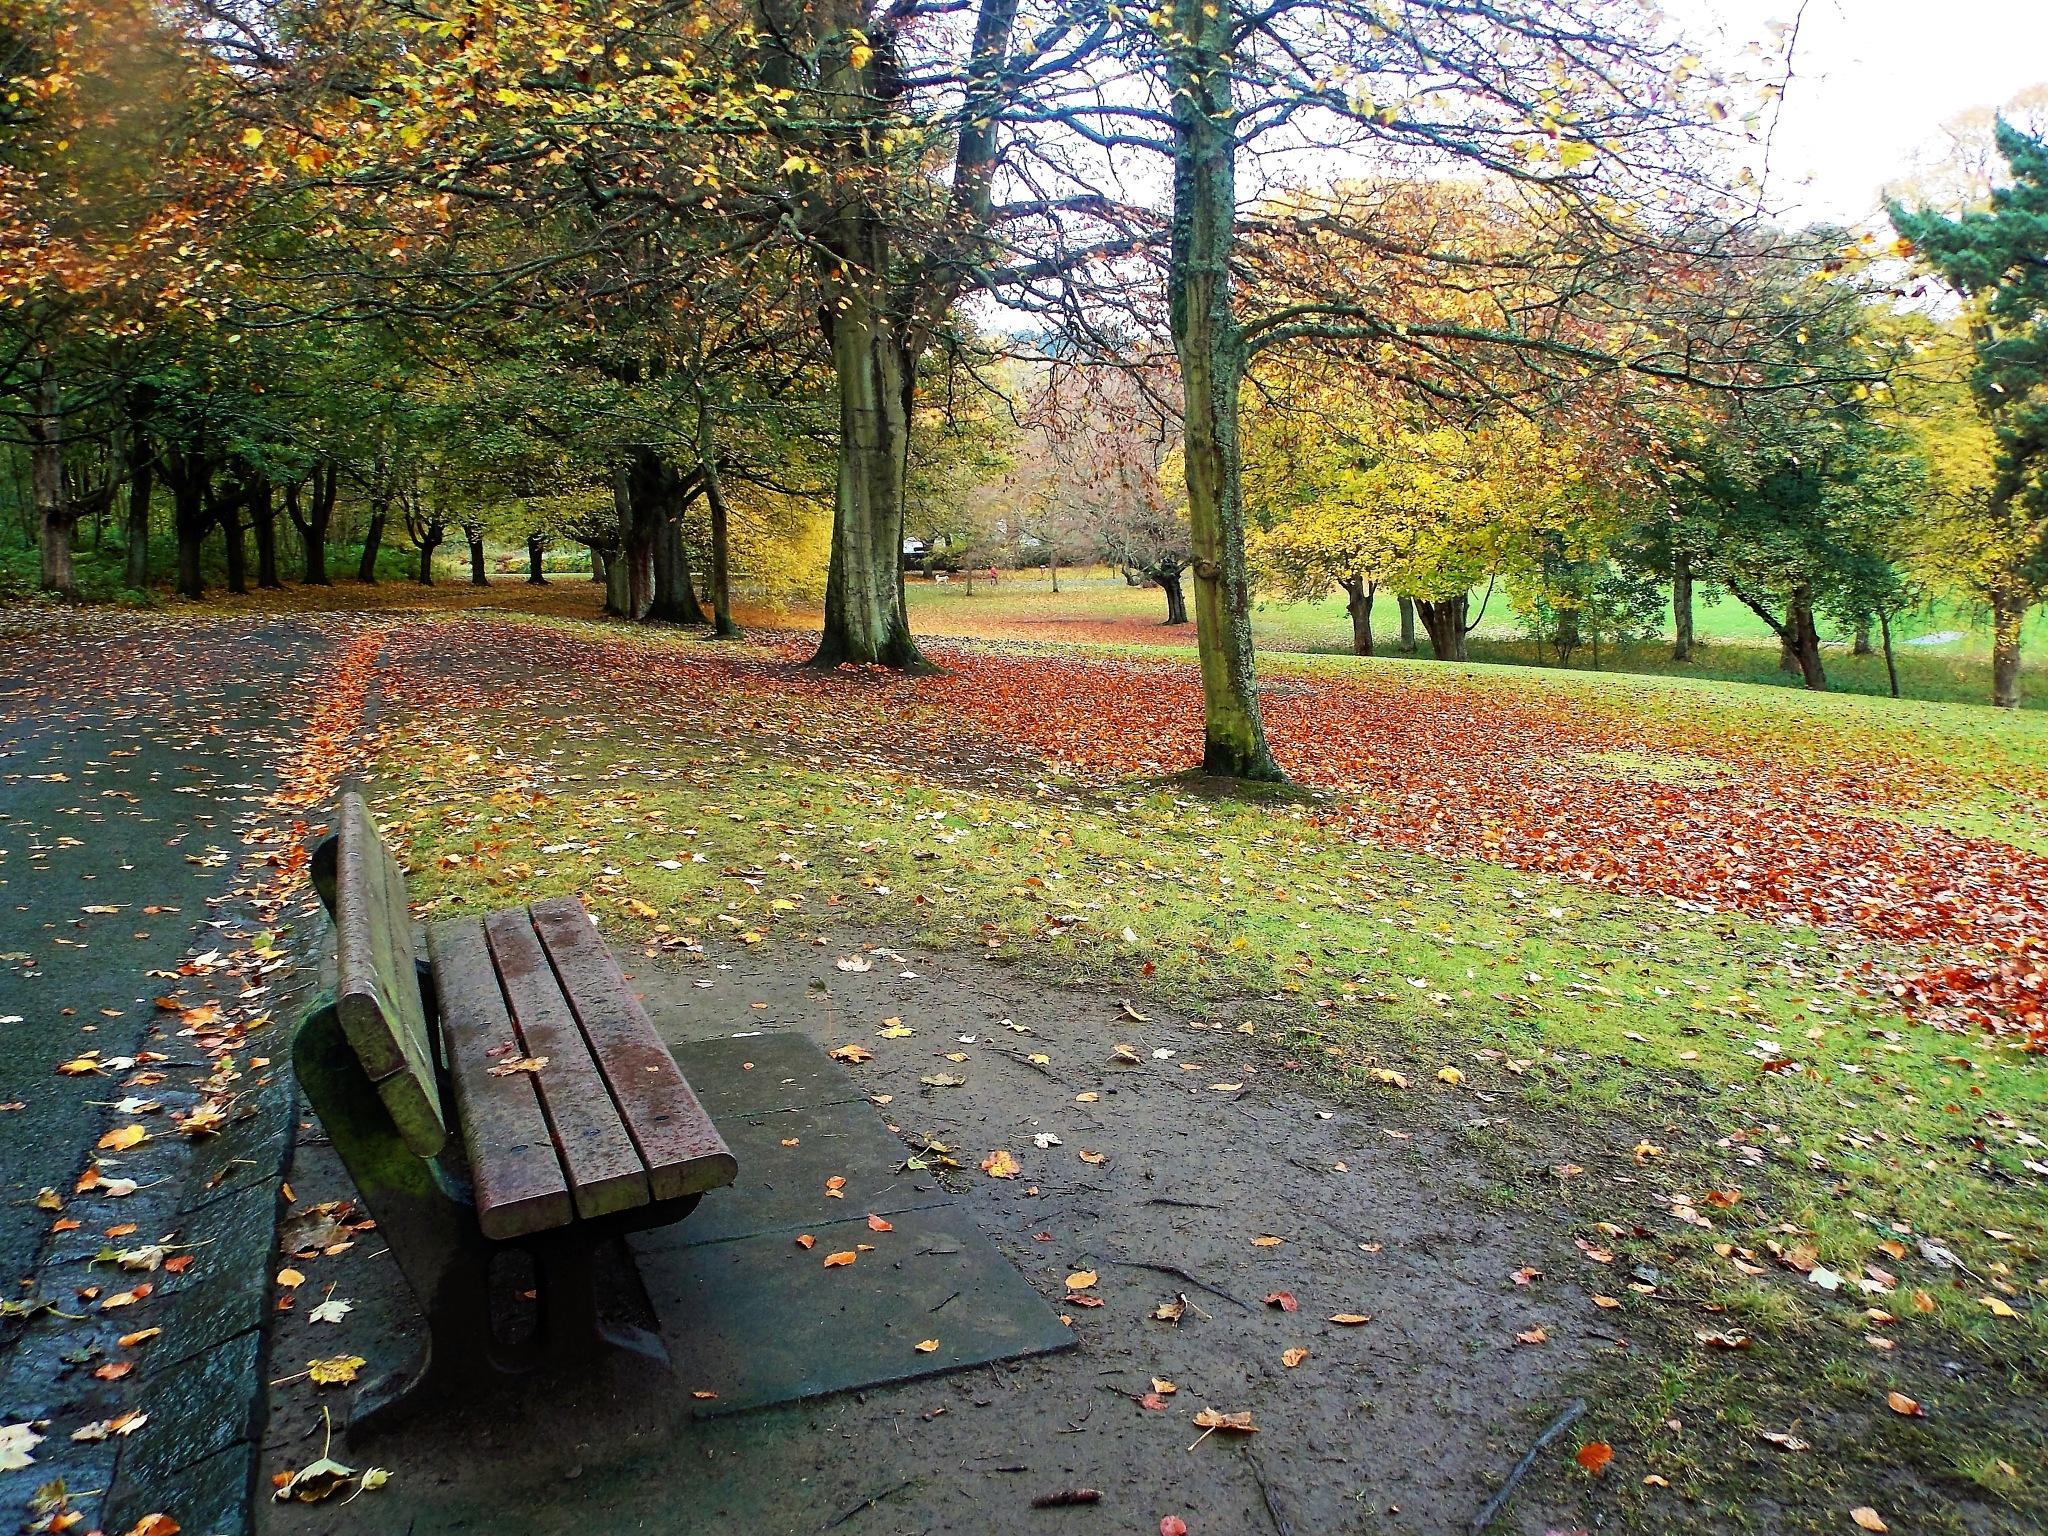 """Amazing Autumn"" by Thania Wehmeyer"